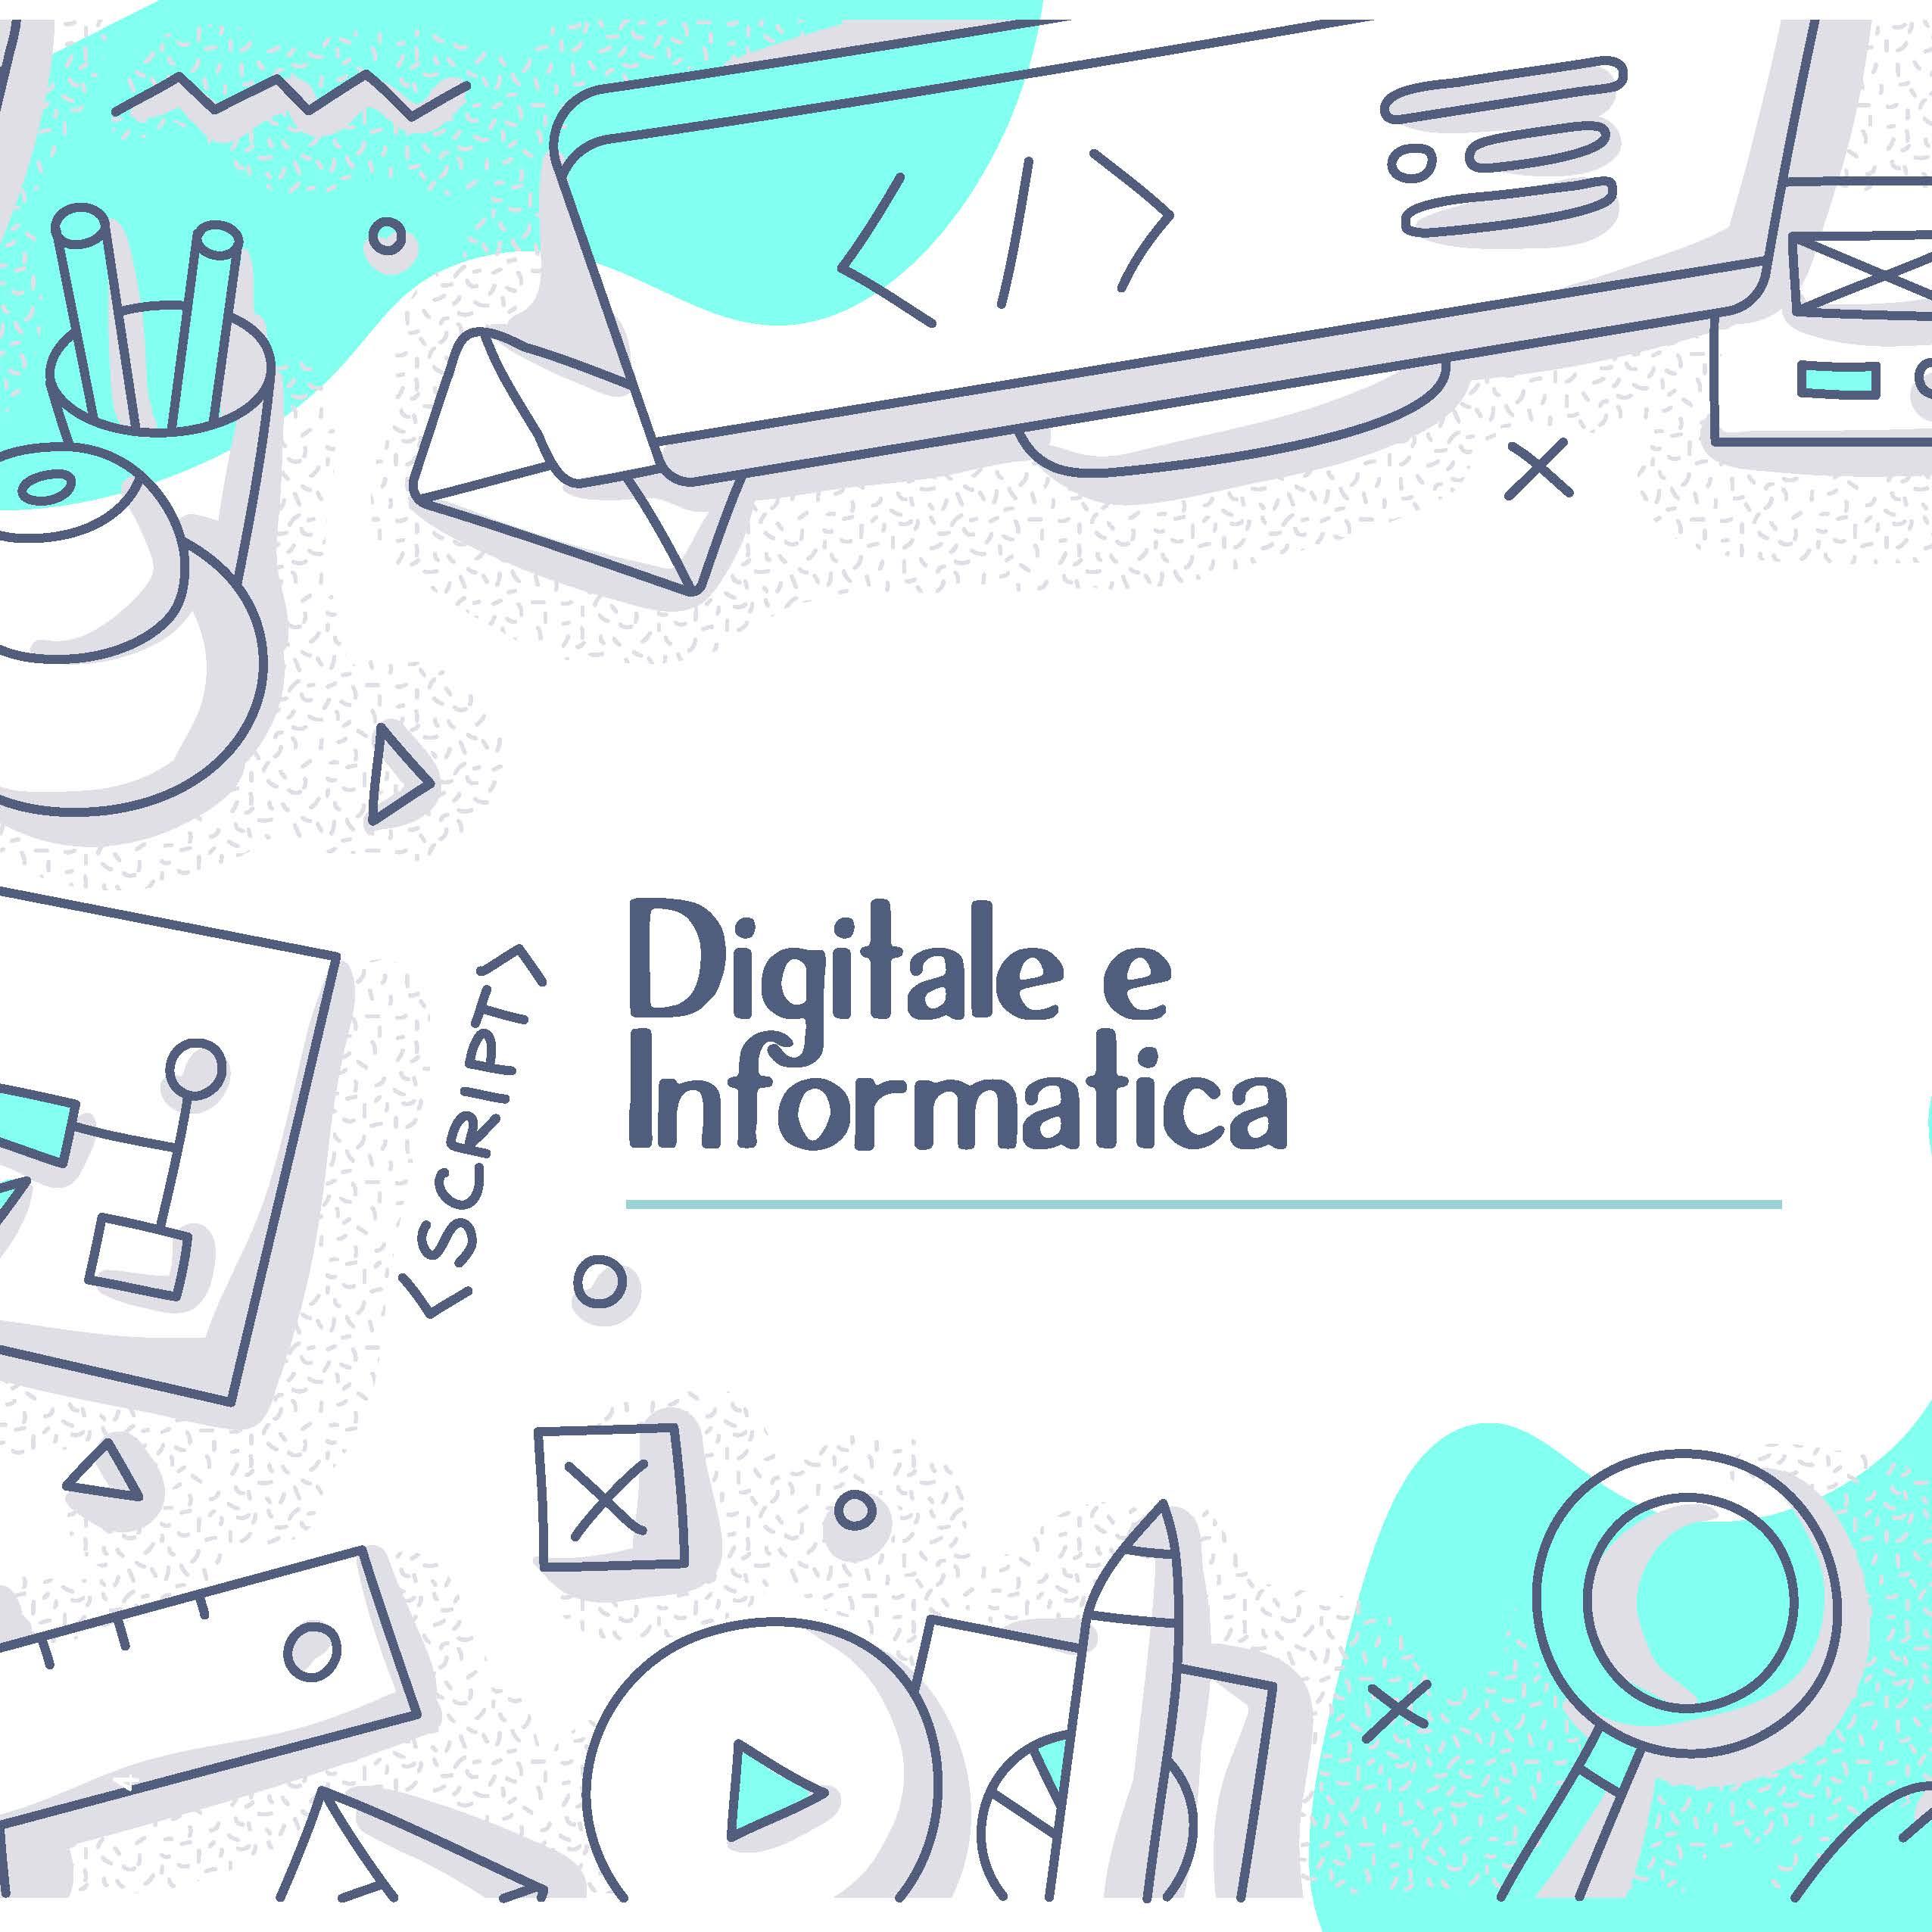 Digitale e Informatica